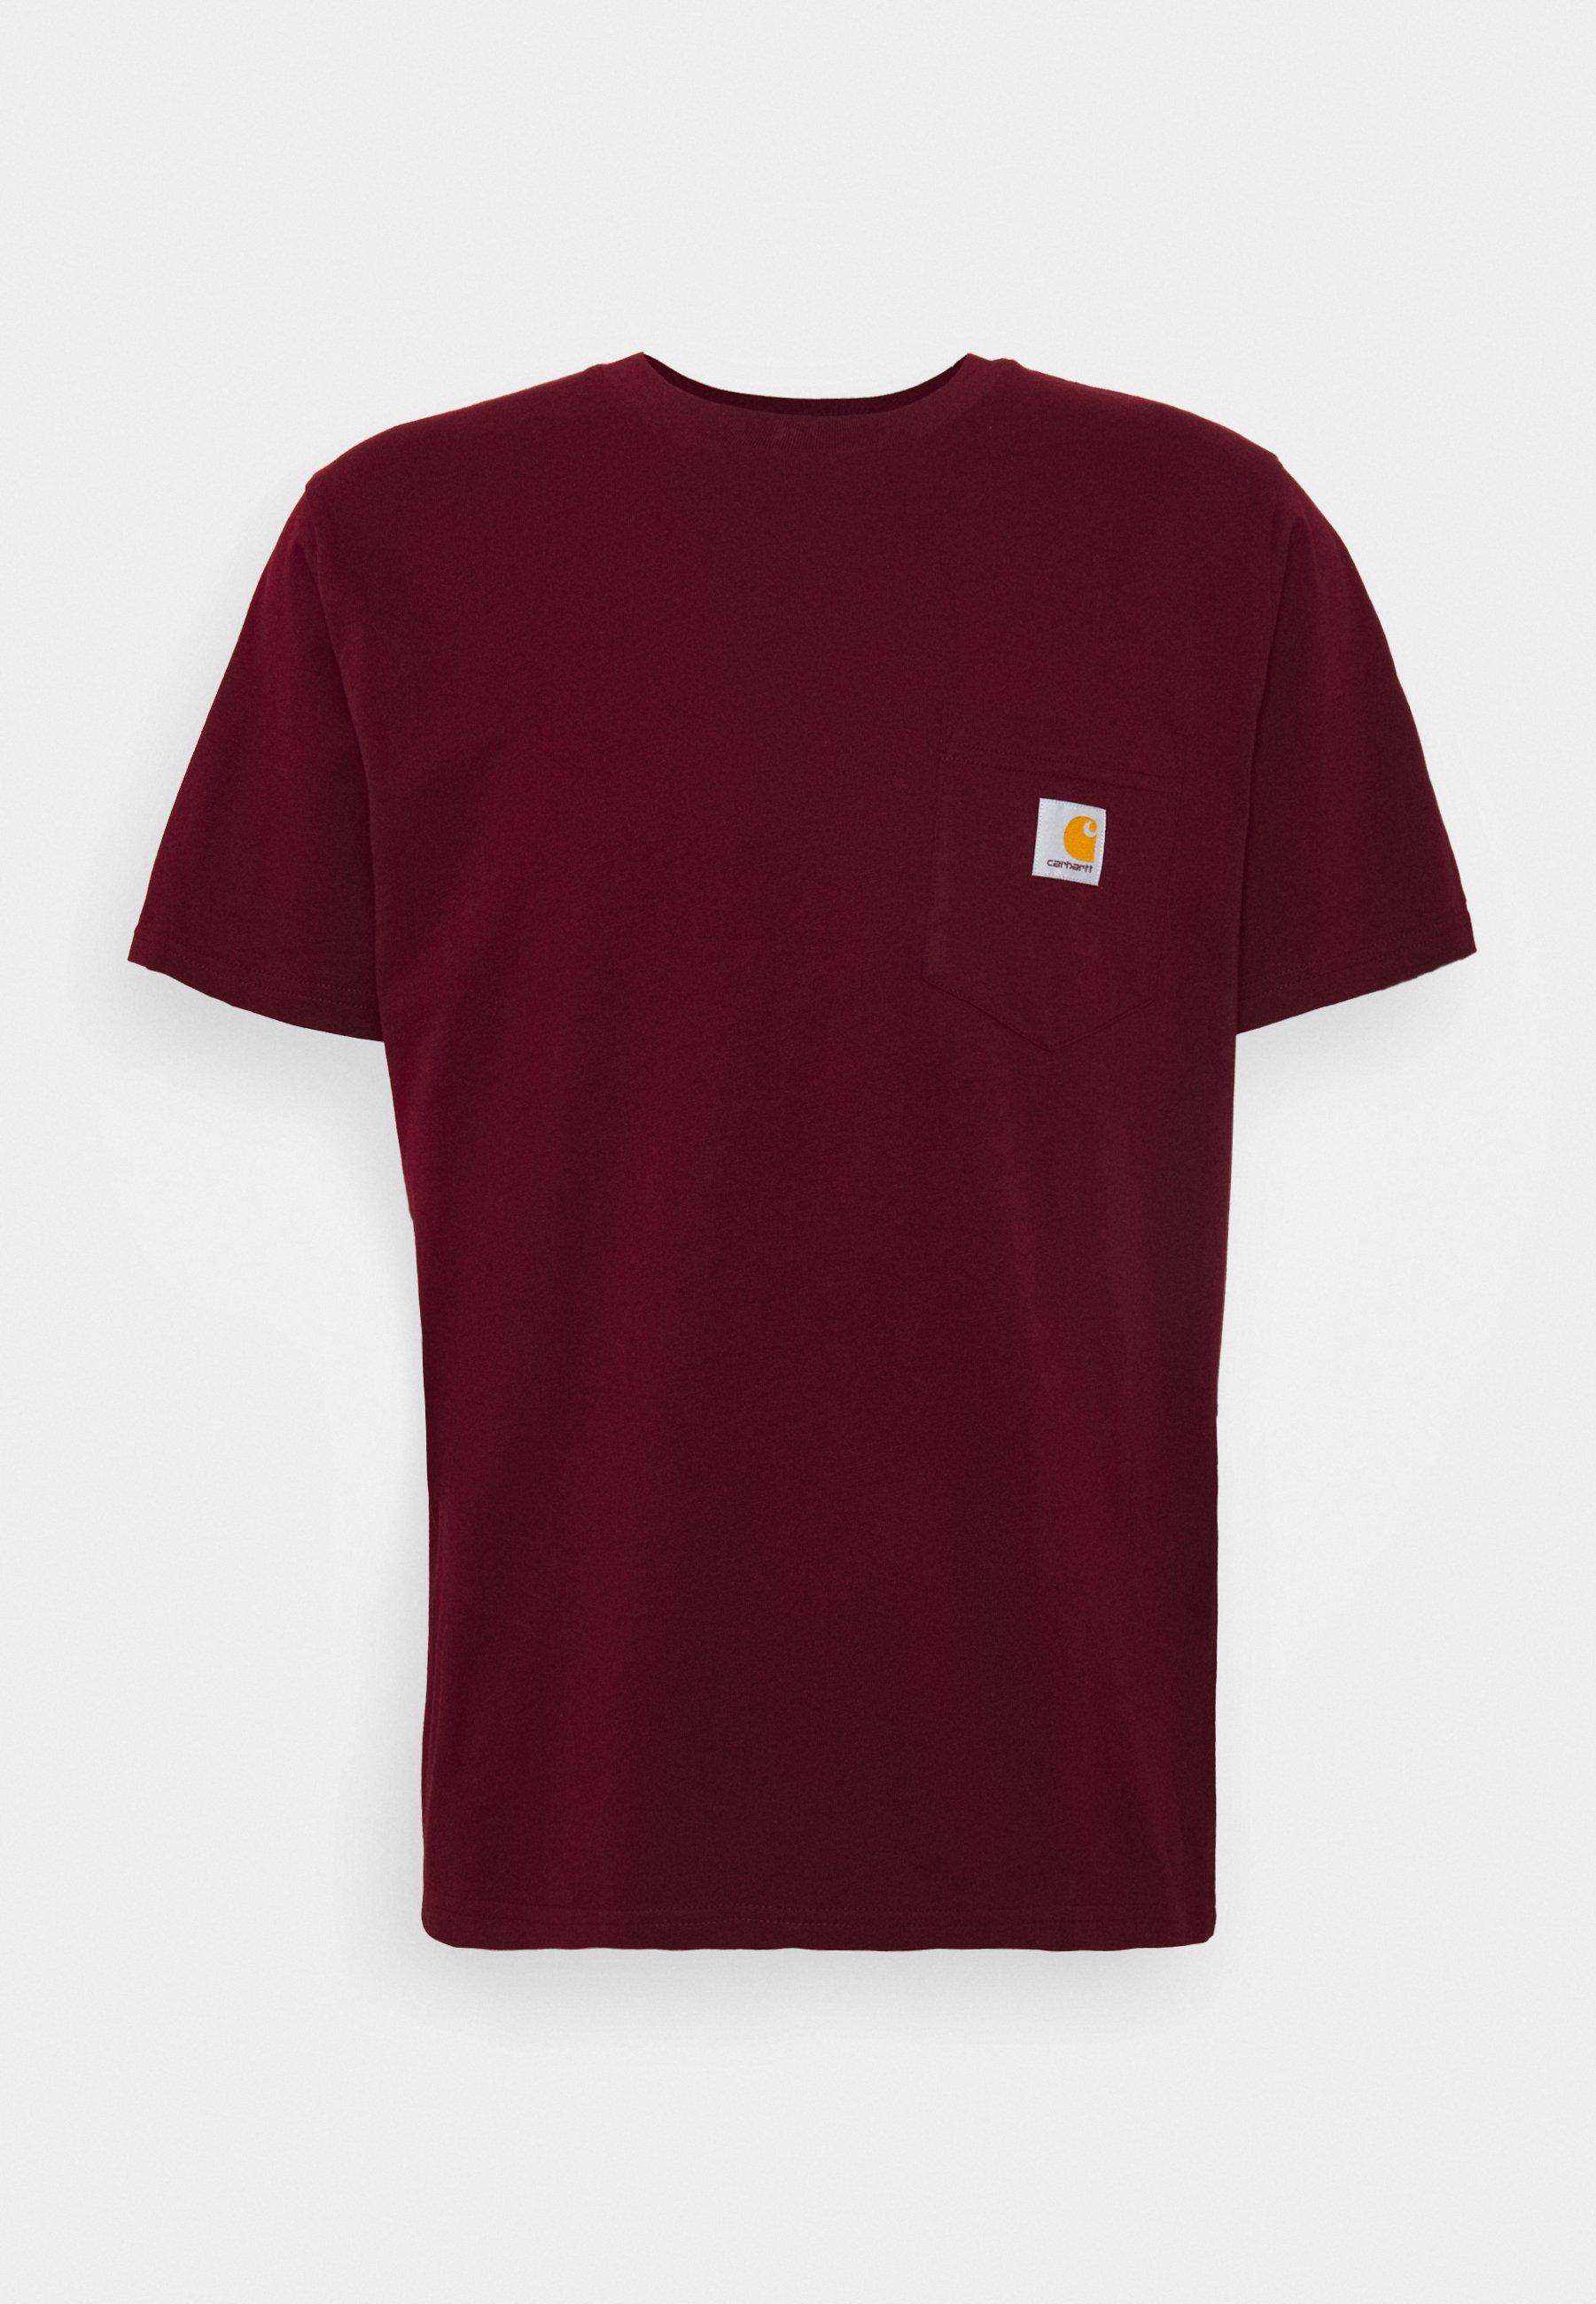 alma Bombero petrolero  Carhartt WIP Camiseta básica - bordeaux/burdeos - Zalando.es